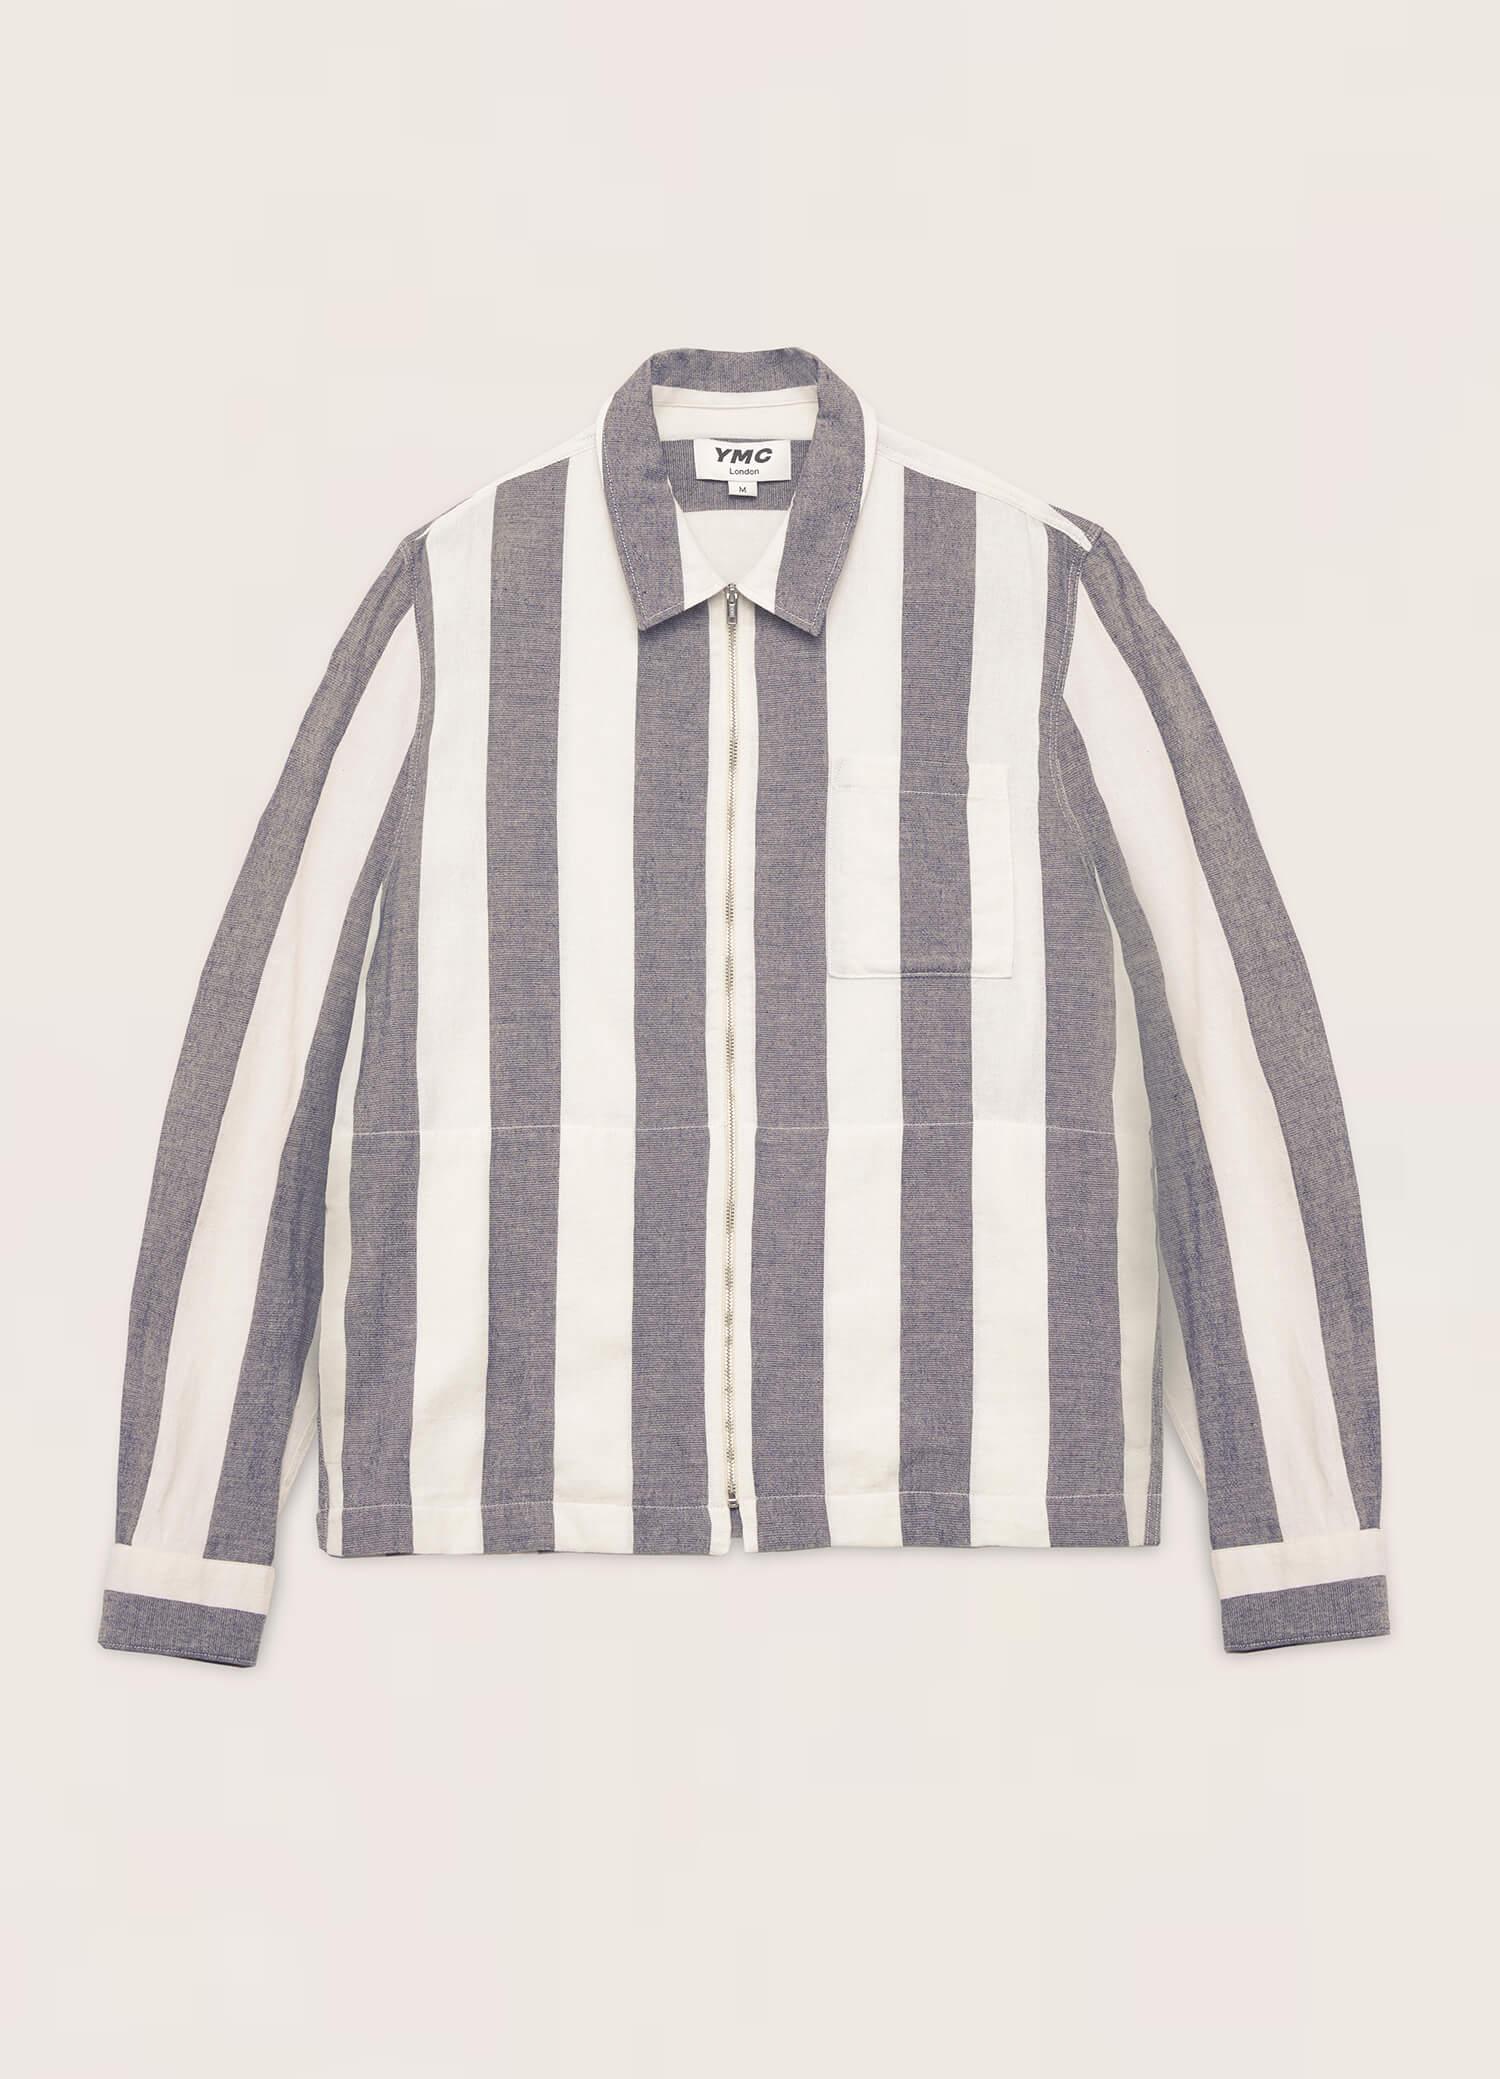 Bowie Cotton Linen Stripe Zip Shirt Blue